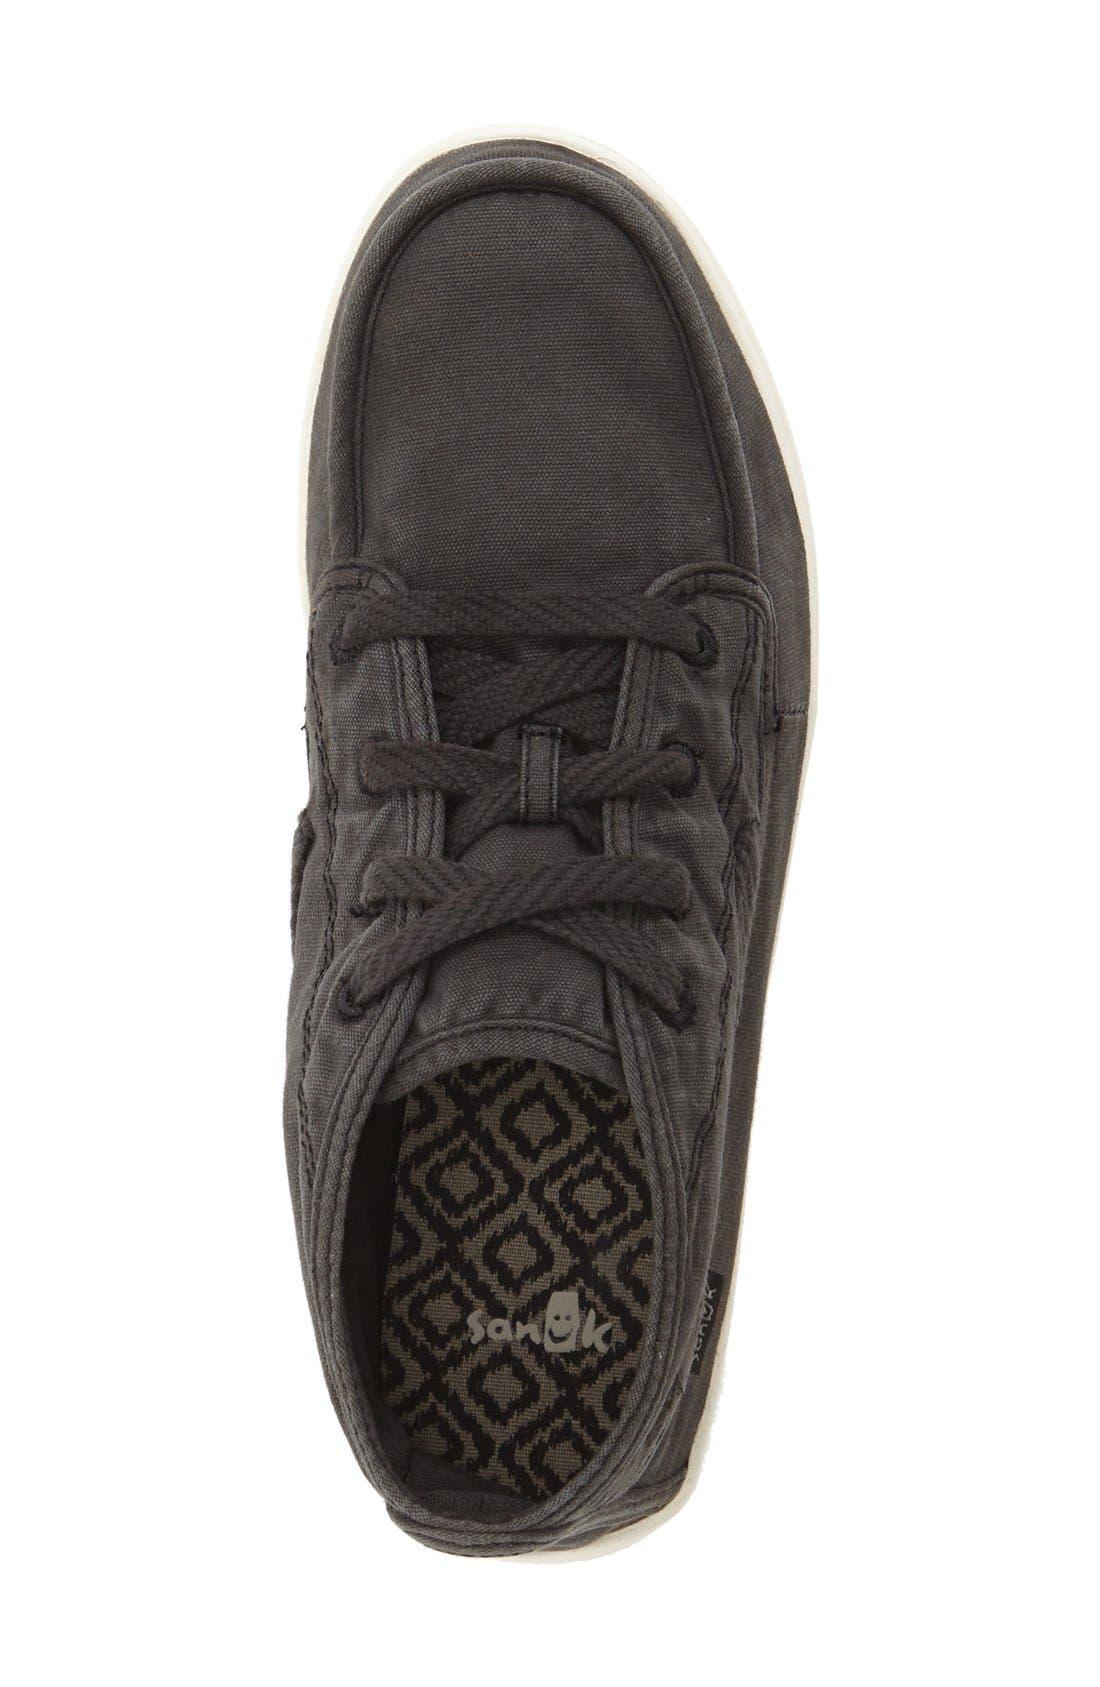 'Vee K Shawn' High Top Sneaker,                             Alternate thumbnail 4, color,                             006